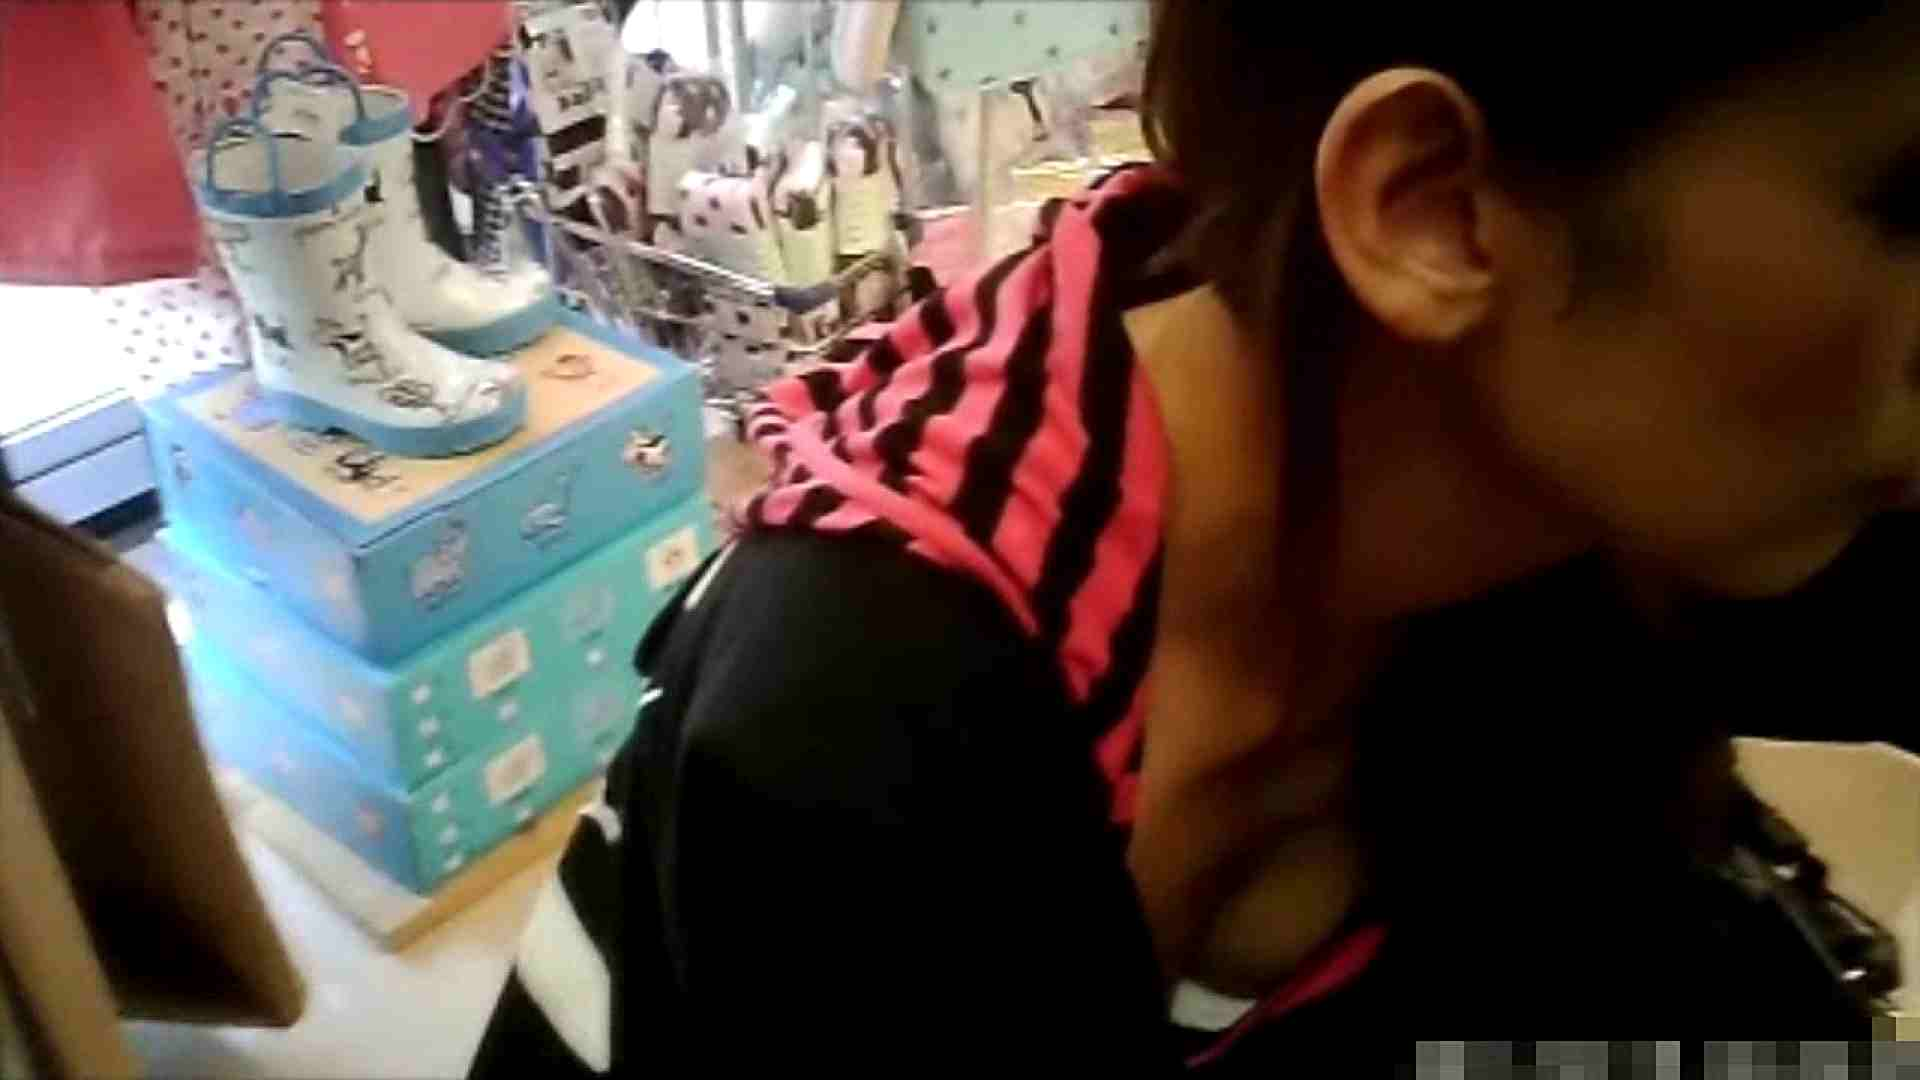 NO.6 雑貨屋で買い物中のガーリーな女の子 胸チラ・のぞき AV無料 95枚 71